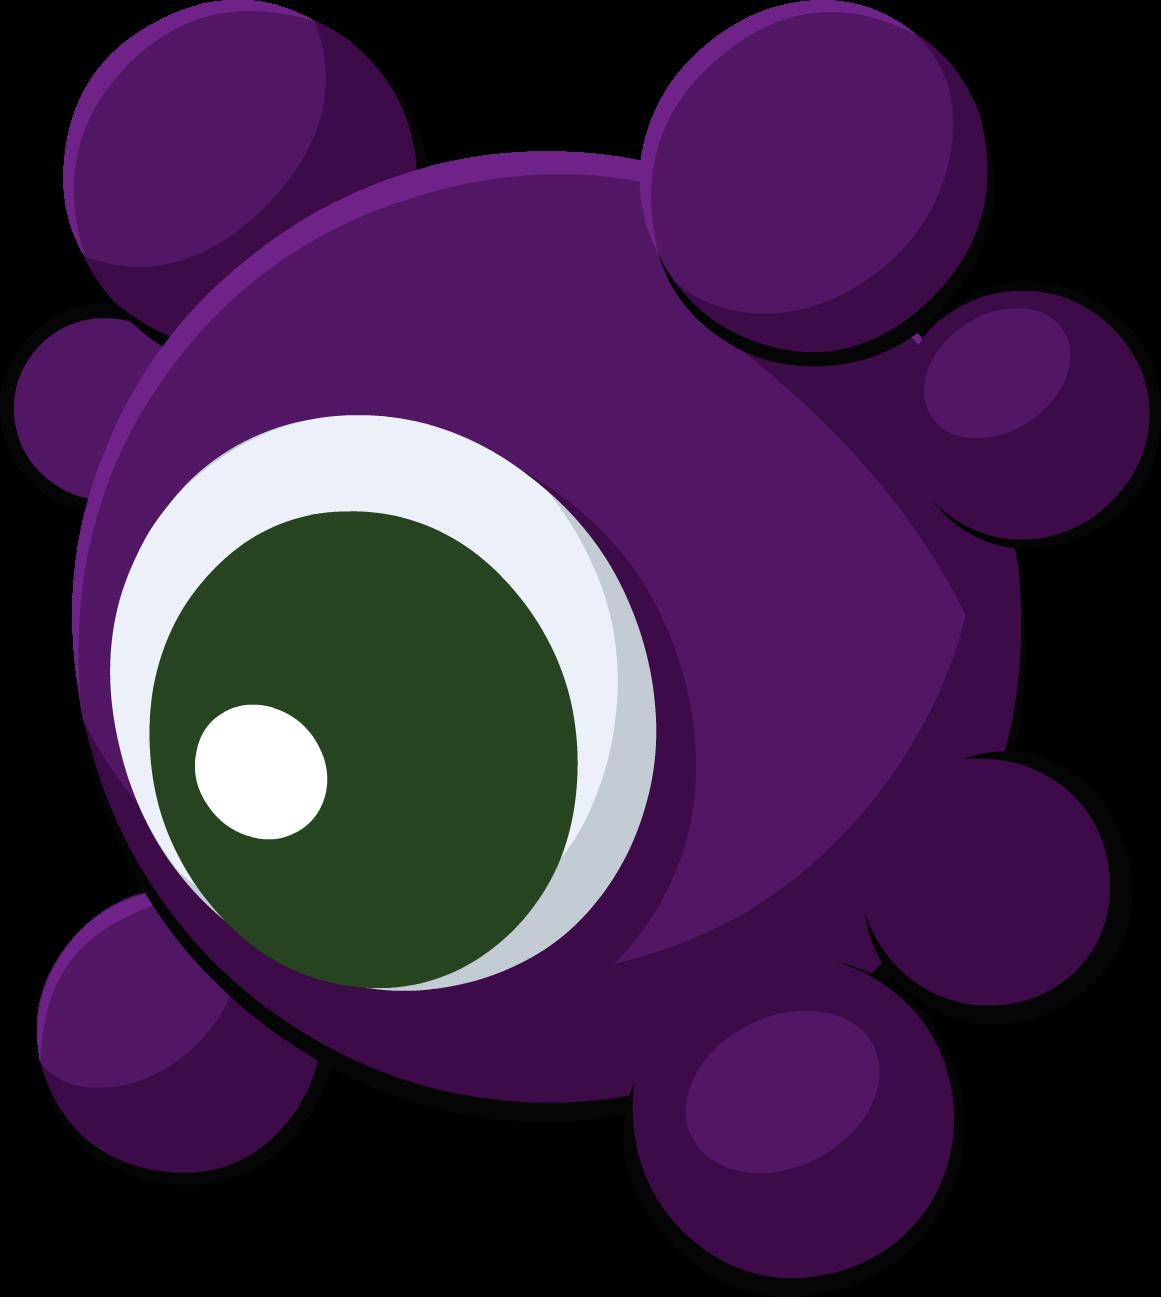 Image pet phantom png. Hippopotamus clipart purple